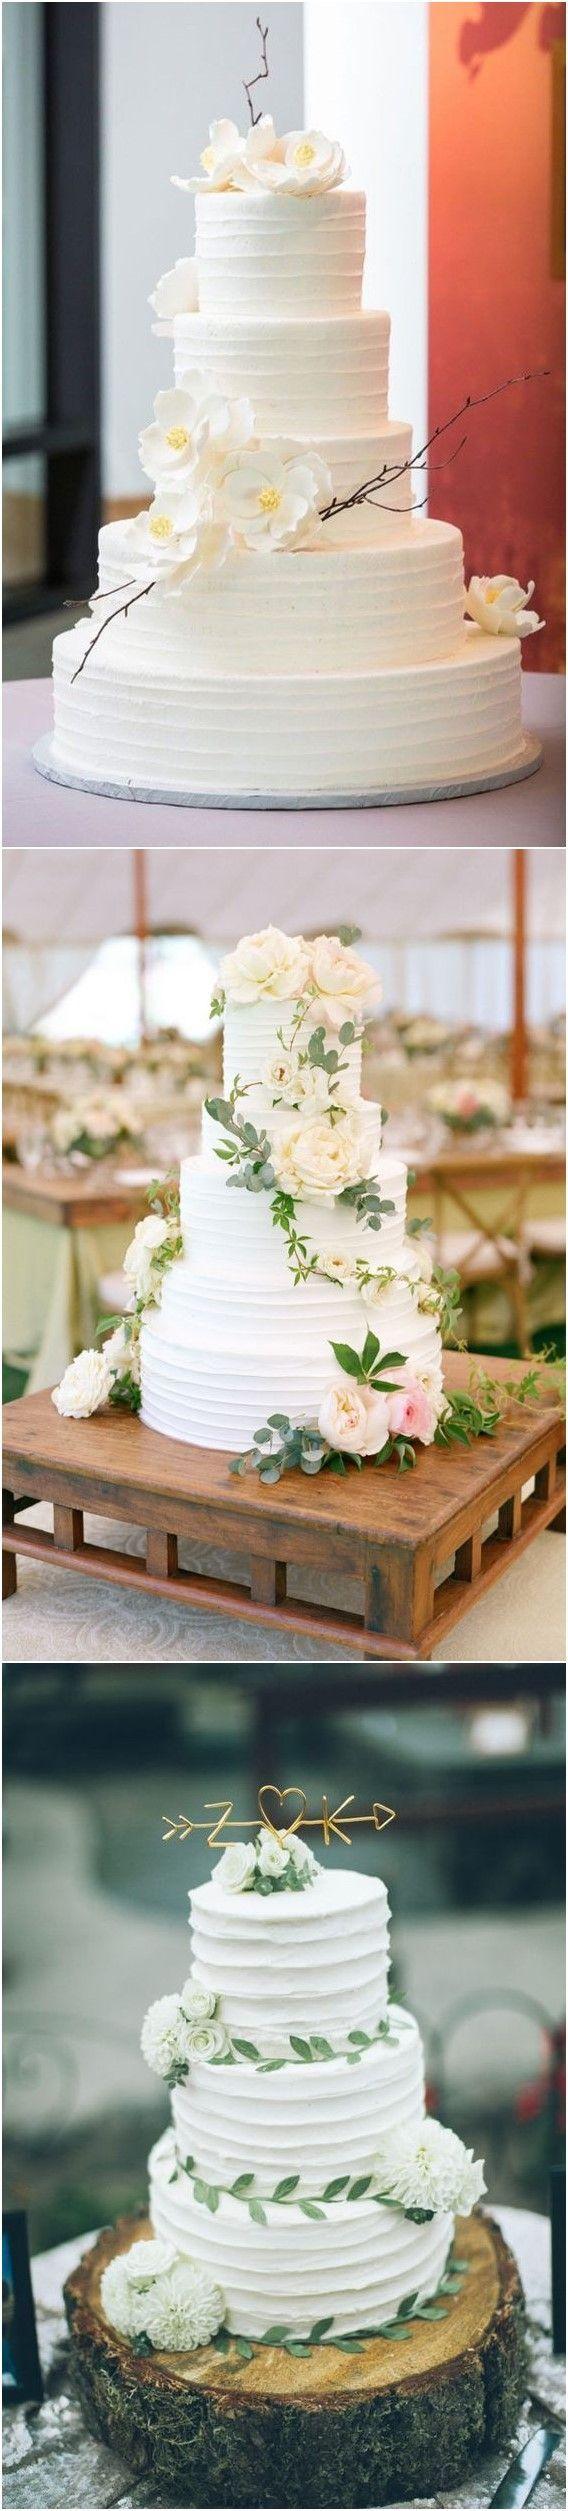 simple white wedding cakes ideas for your wedding wedding